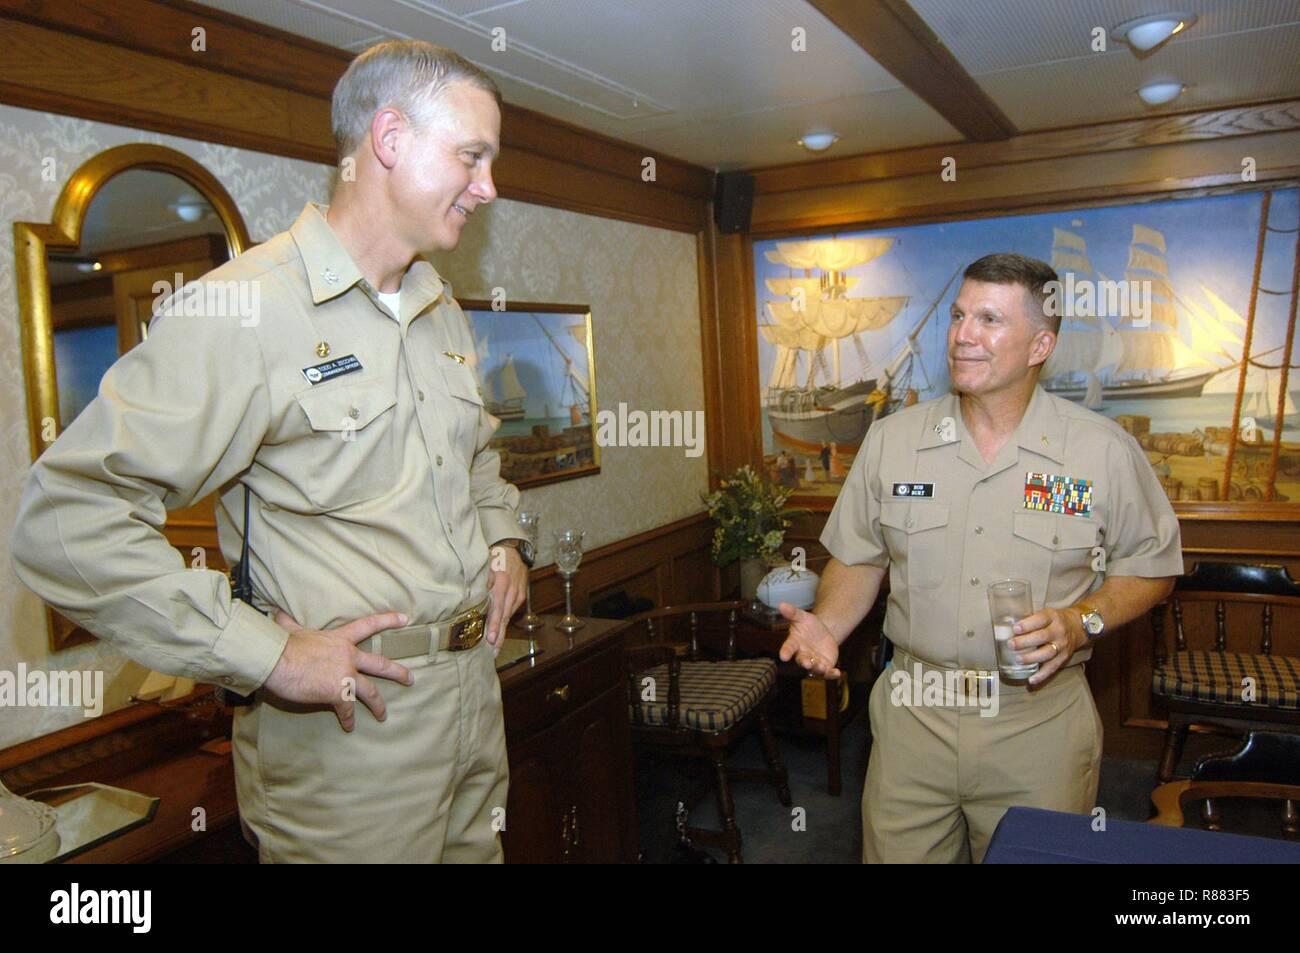 Capt. Todd A. Zecchin (left) welcomes Rear Adm. (Upper Half) Robert F. Burt during his visit aboard USS John F. Kennedy (CV 67). - Stock Image